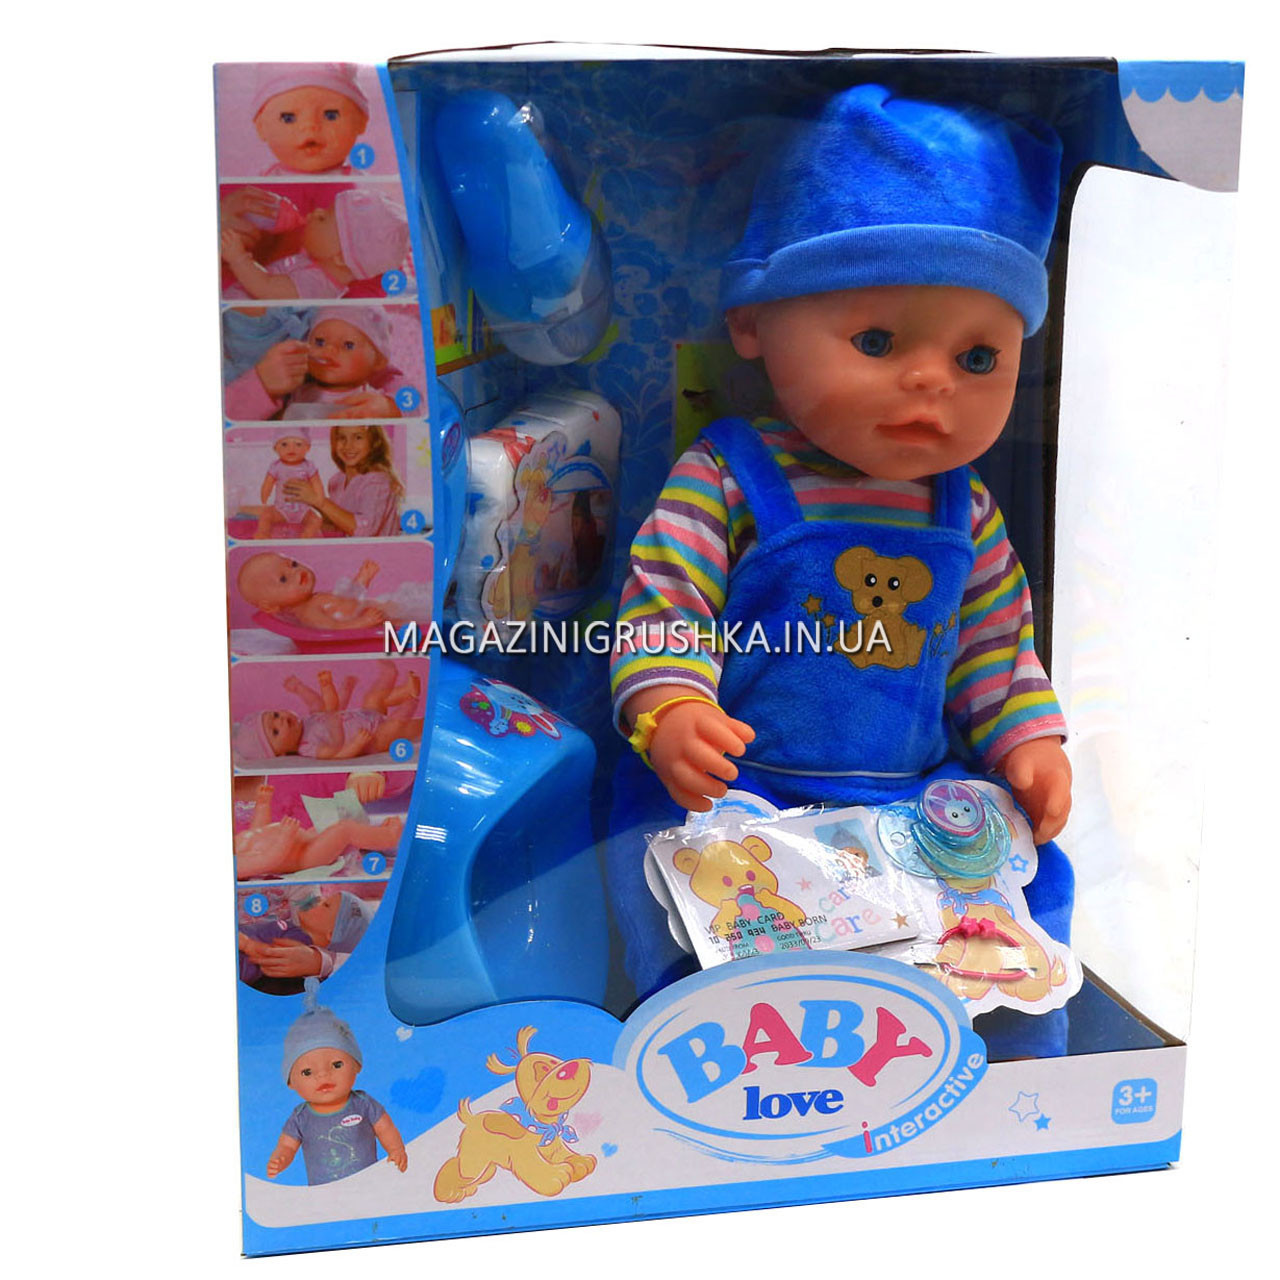 Интерактивная кукла Baby Born (беби бон). Пупс с одеждой и аксессуарами, 8 функций беби борн, 43 см (BL033E)